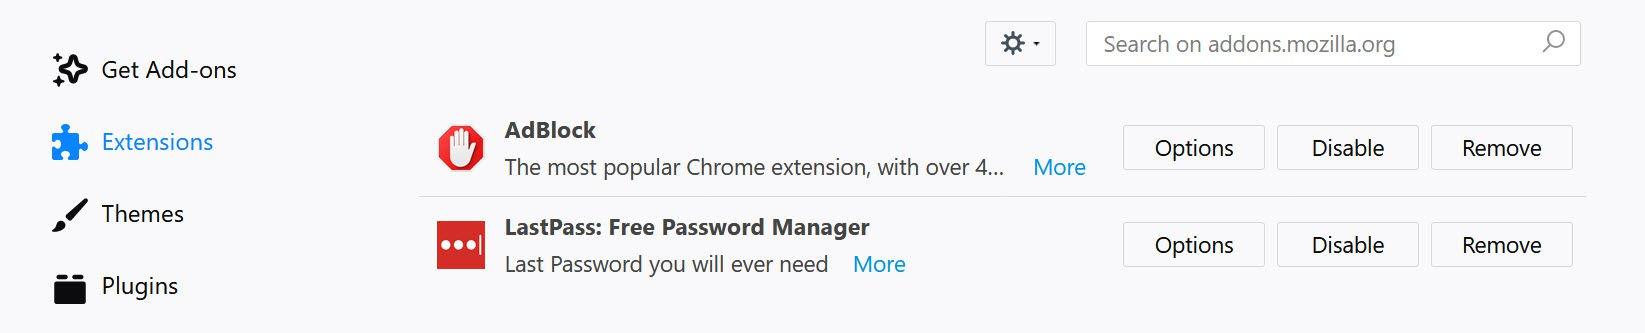 virusul Browser redirect